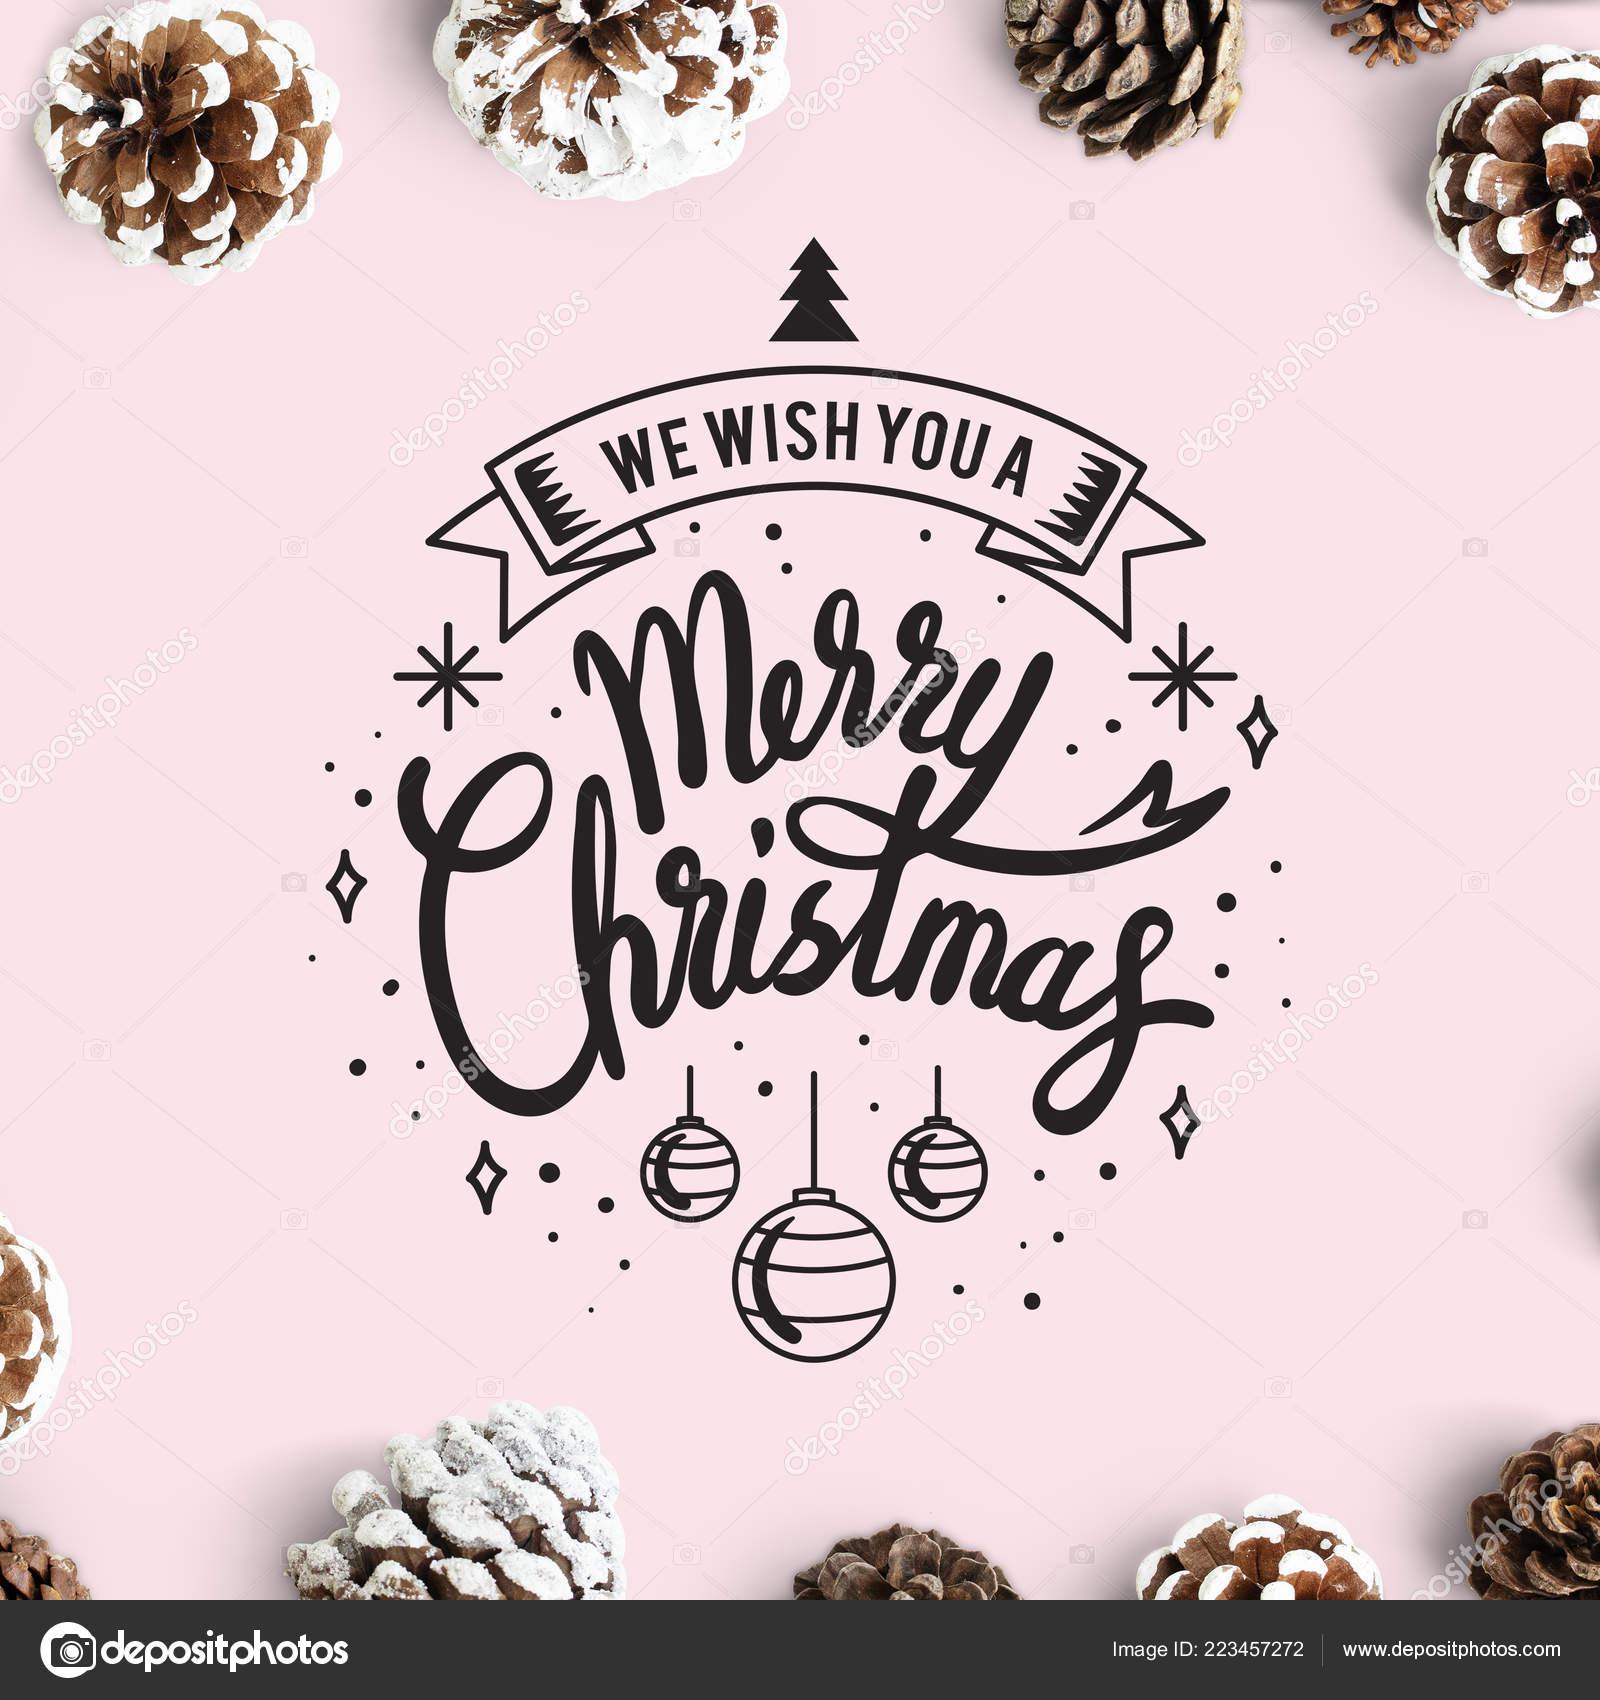 Wish You Merry Christmas Card Mockup — Stock Photo © Rawpixel #223457272